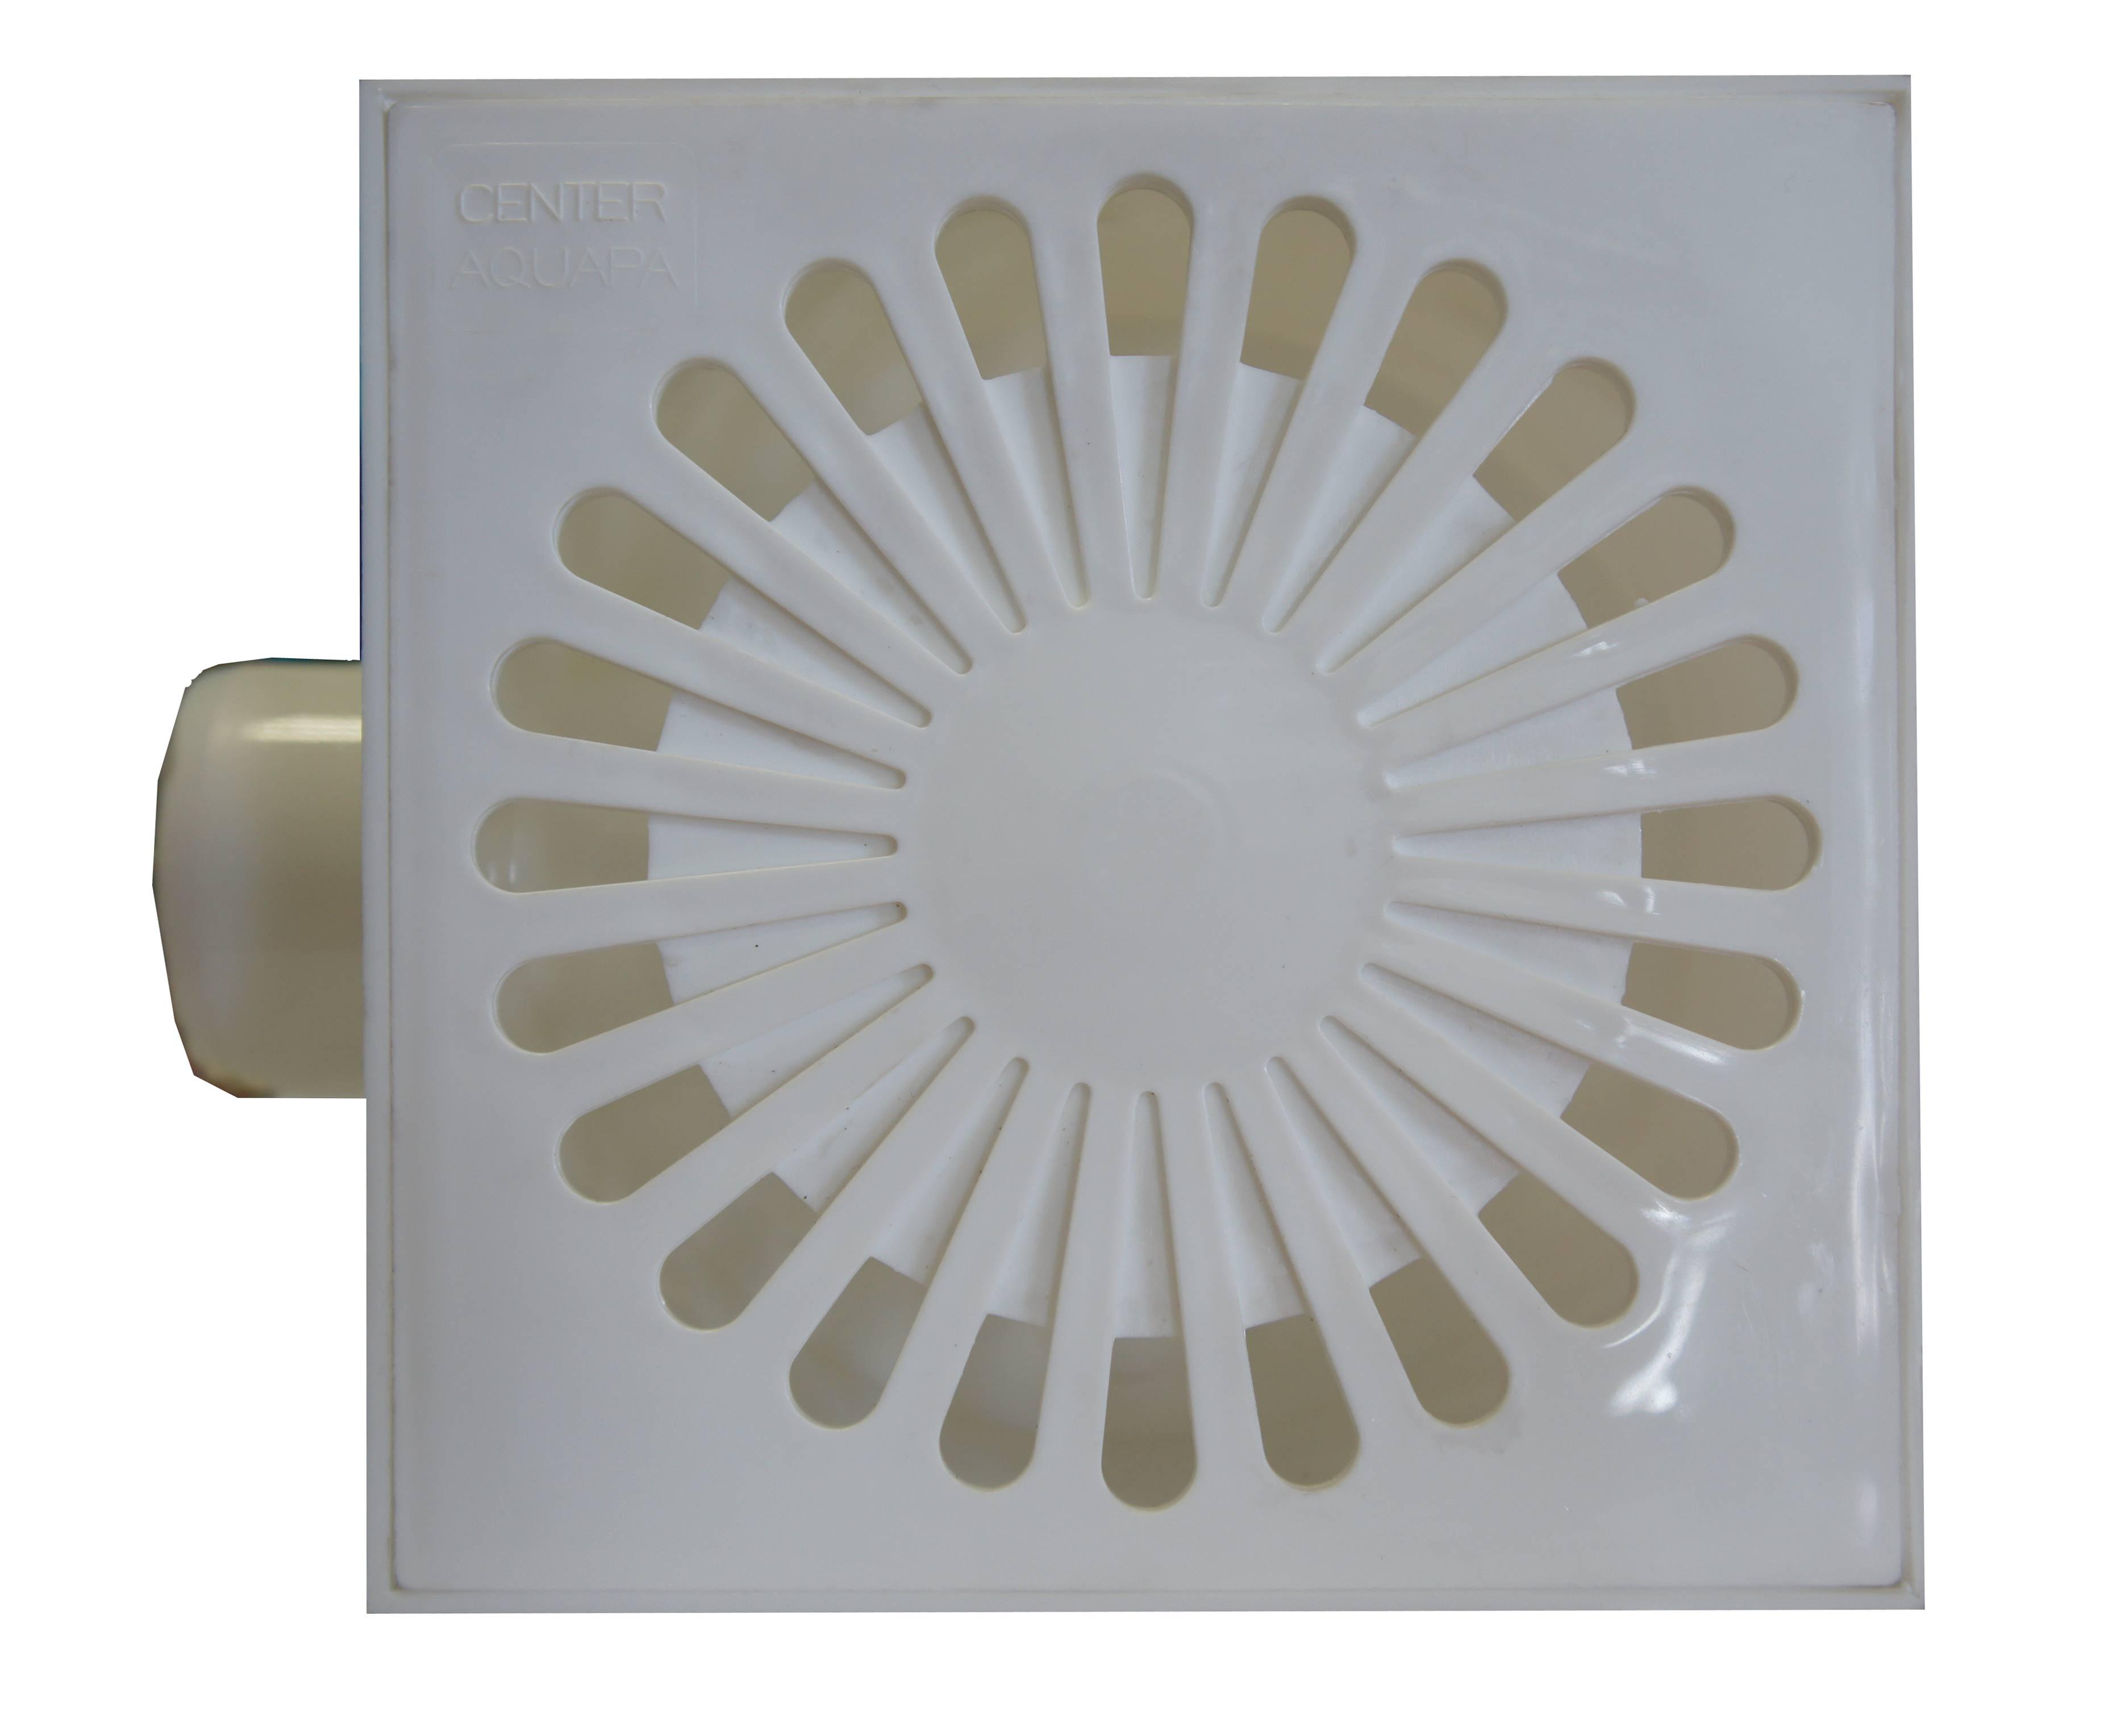 Трап угловой пластиковый 150х150, 50 мм (гидрозатвор)